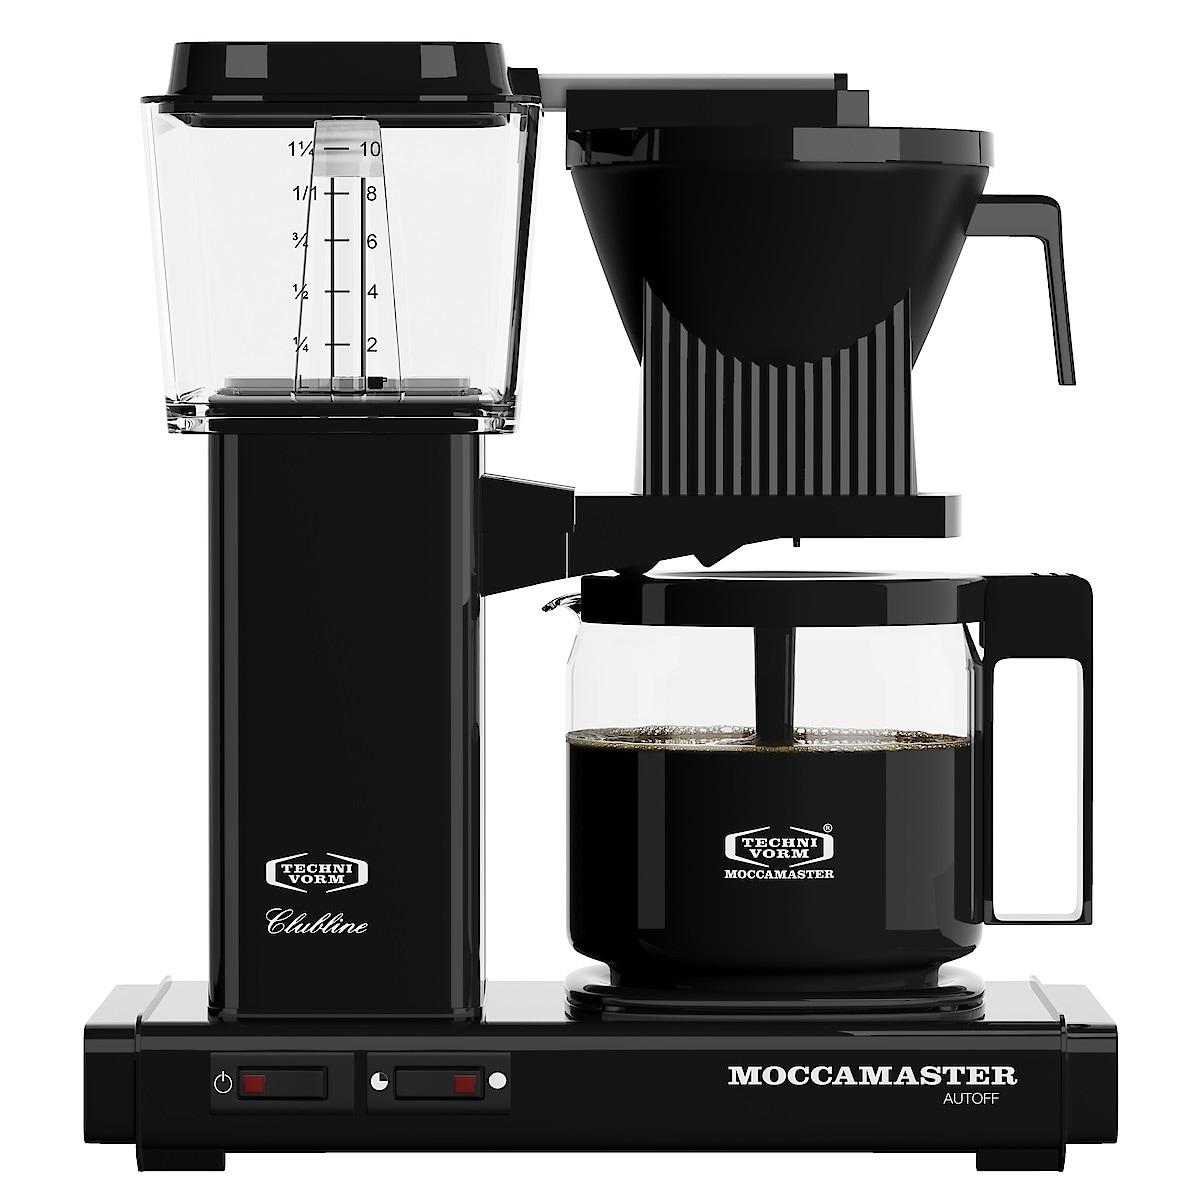 Moccamaster KBG962AO, kaffebryggare